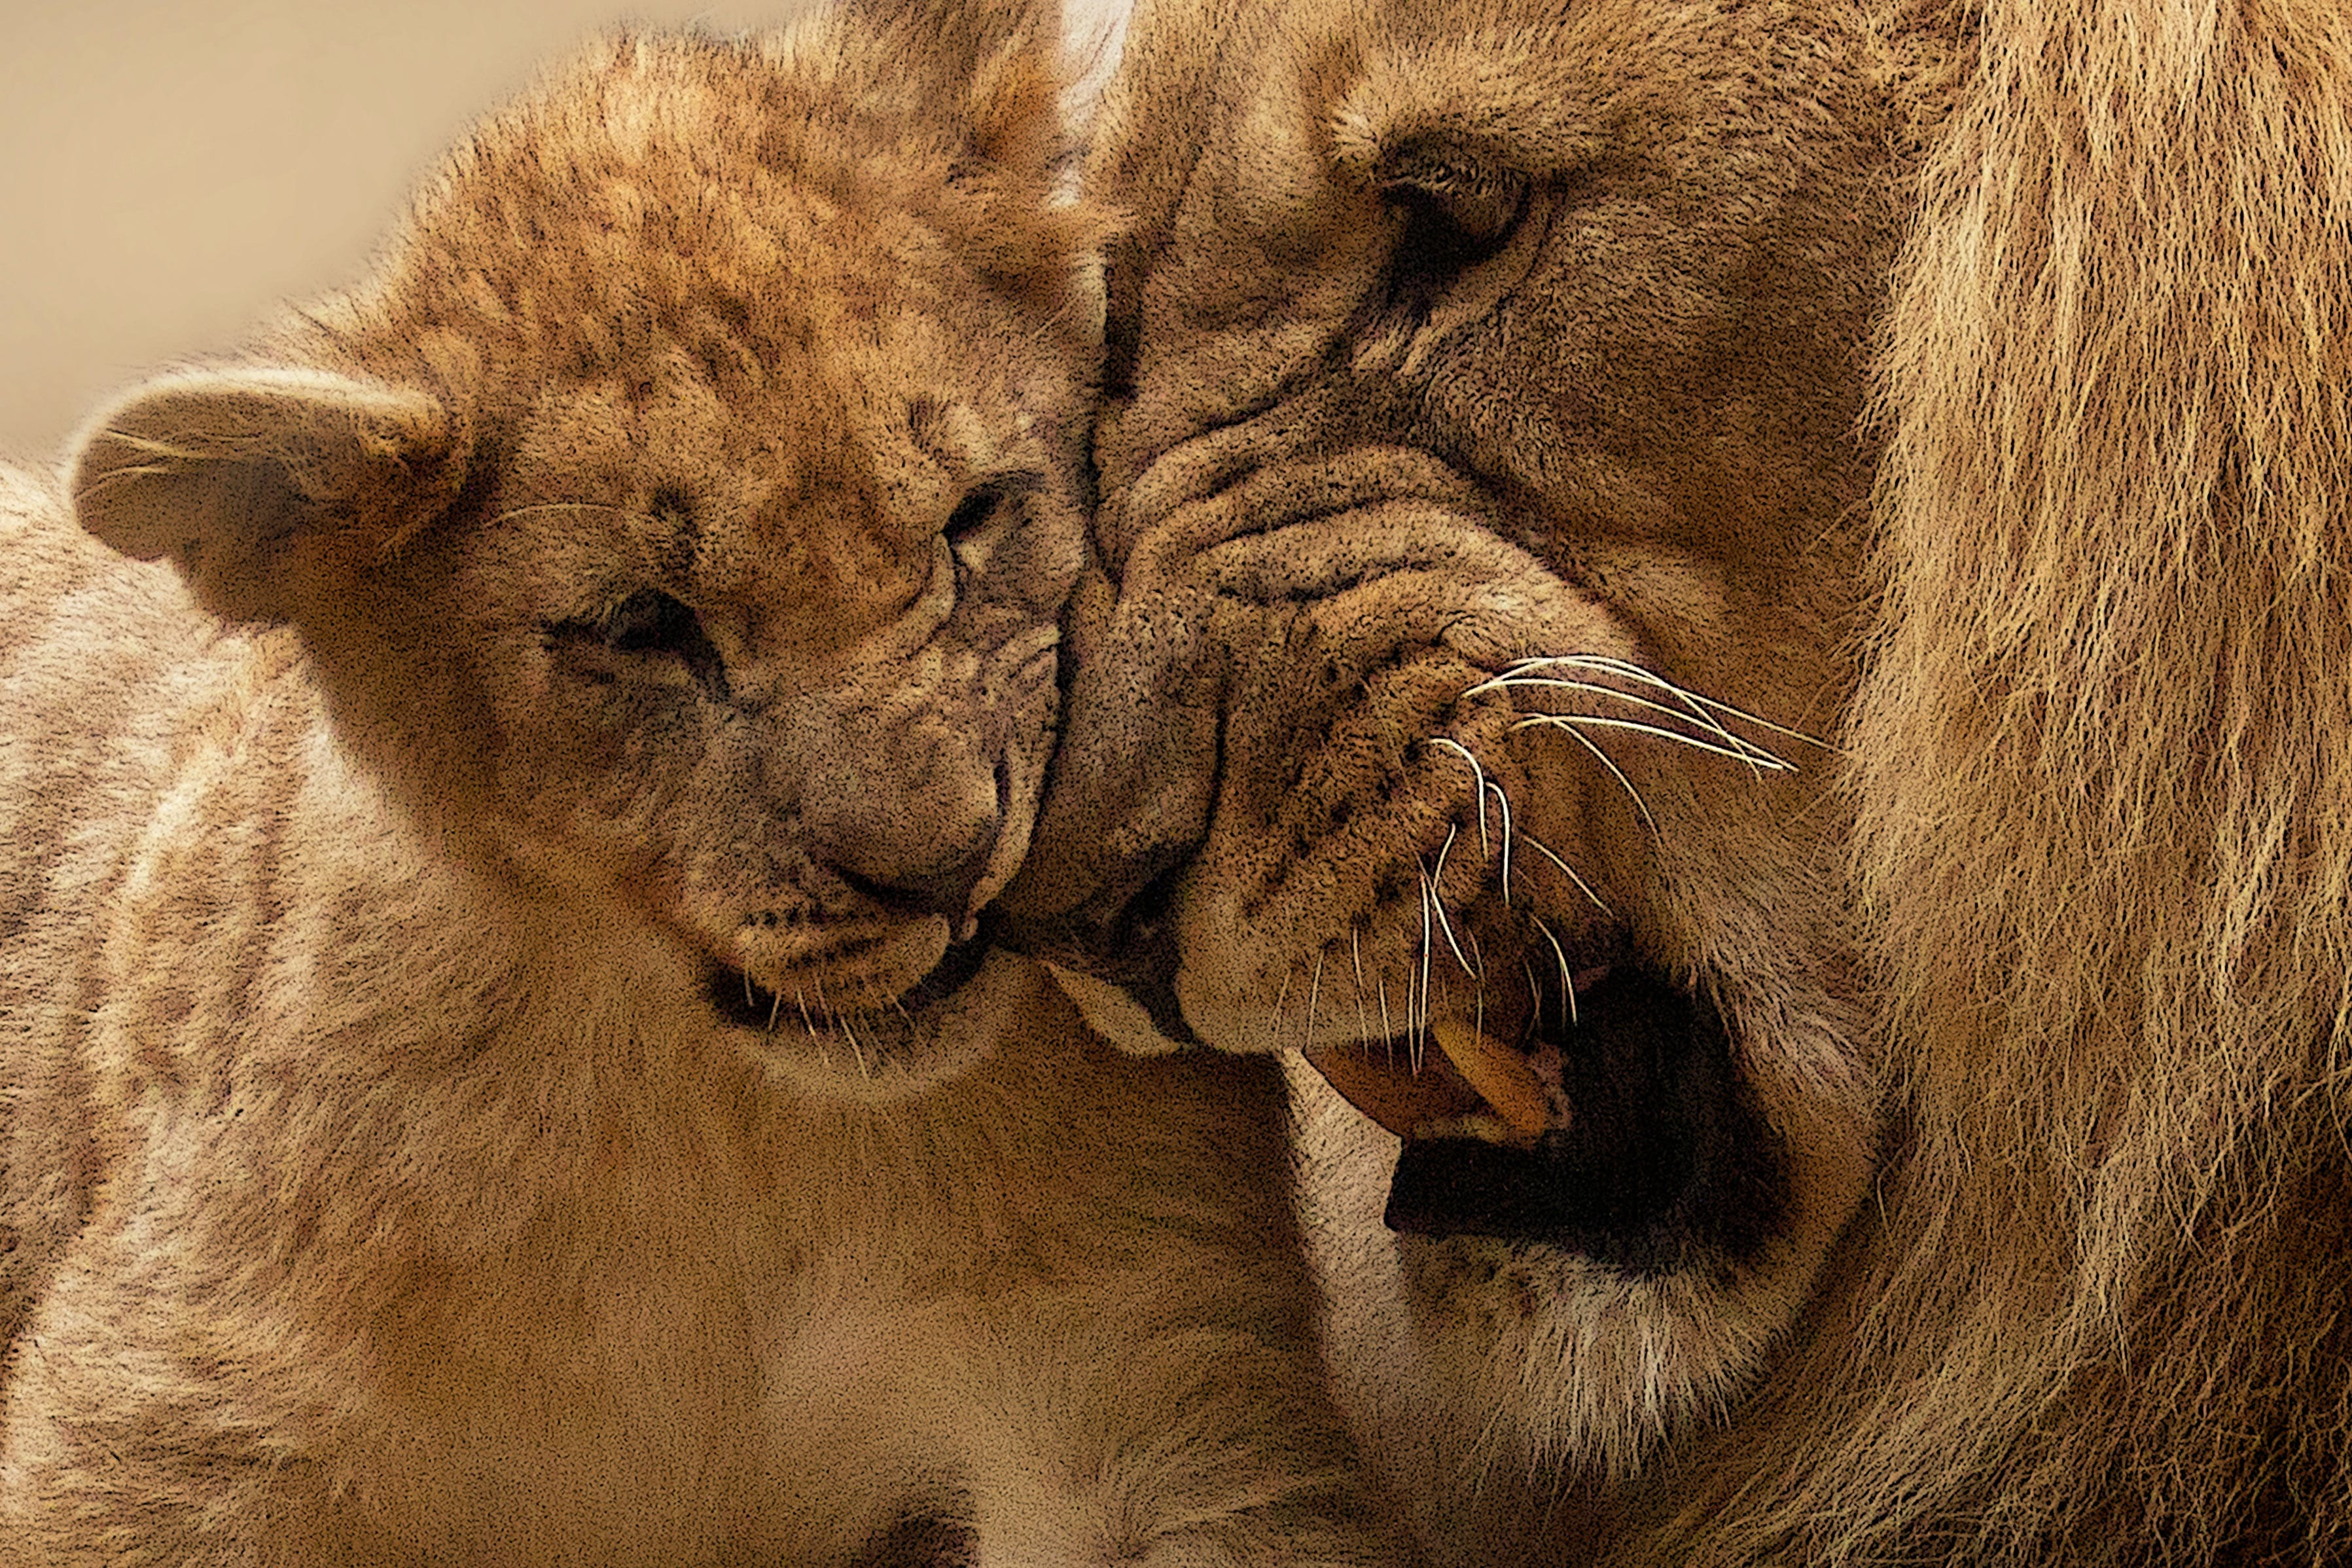 Fotos de stock gratuitas de África, animal, animal joven, animal salvaje